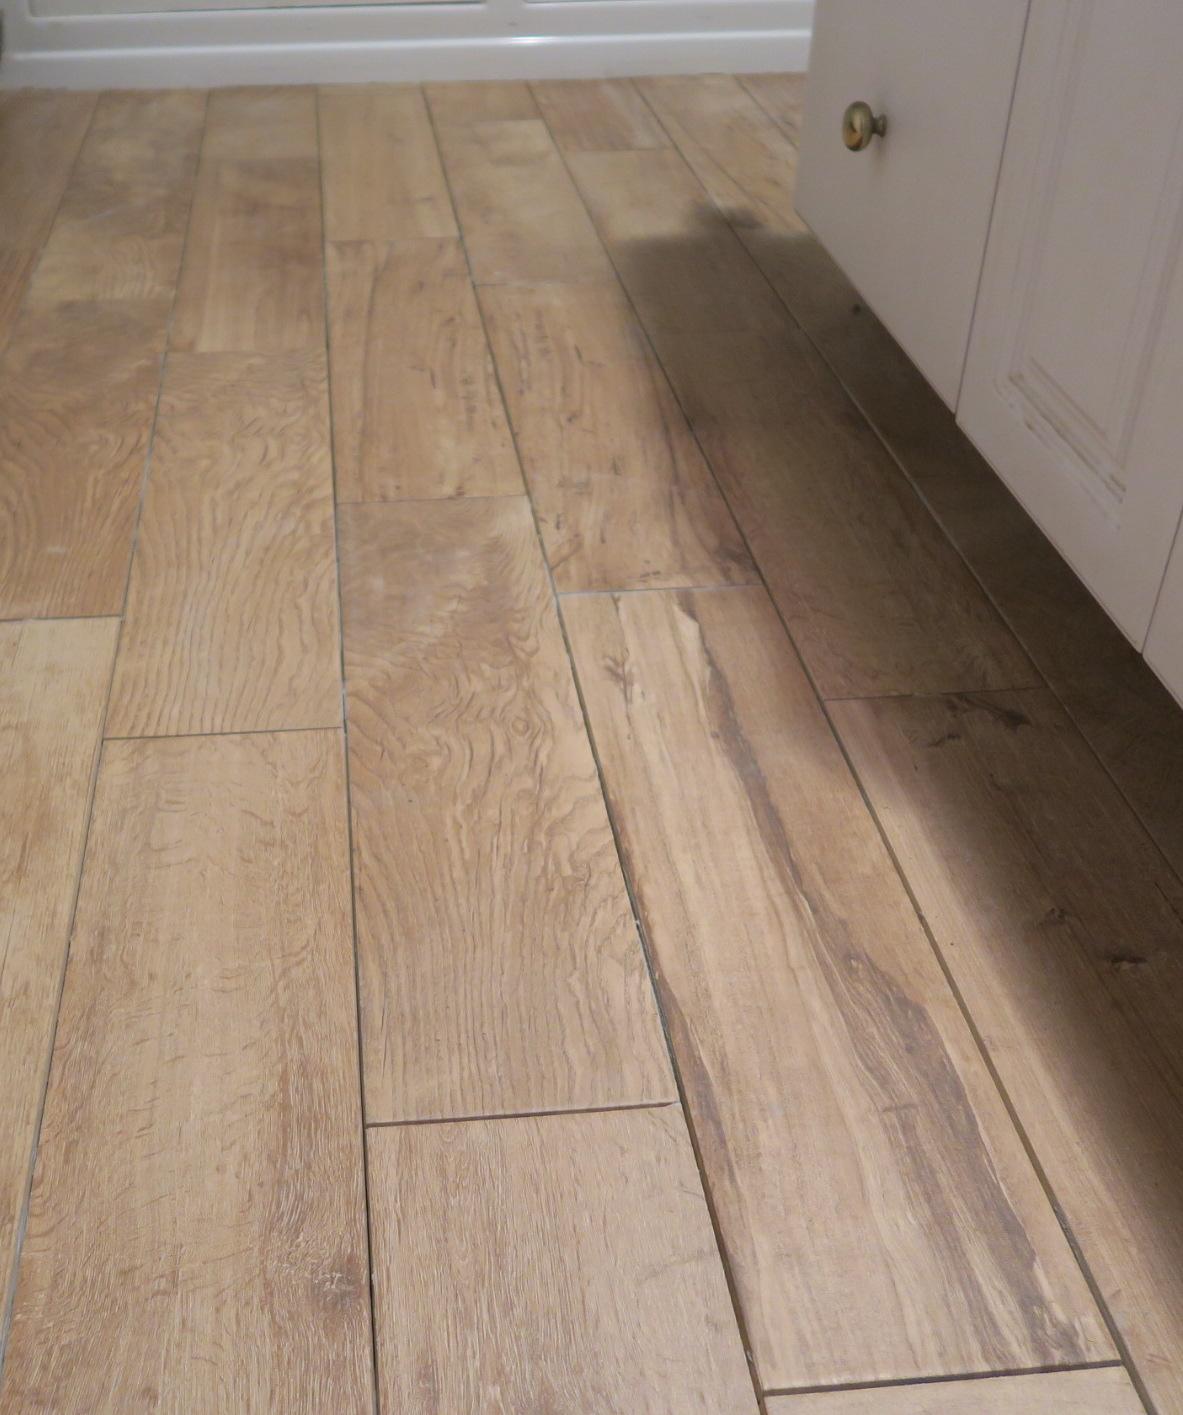 Bathroom tile finish